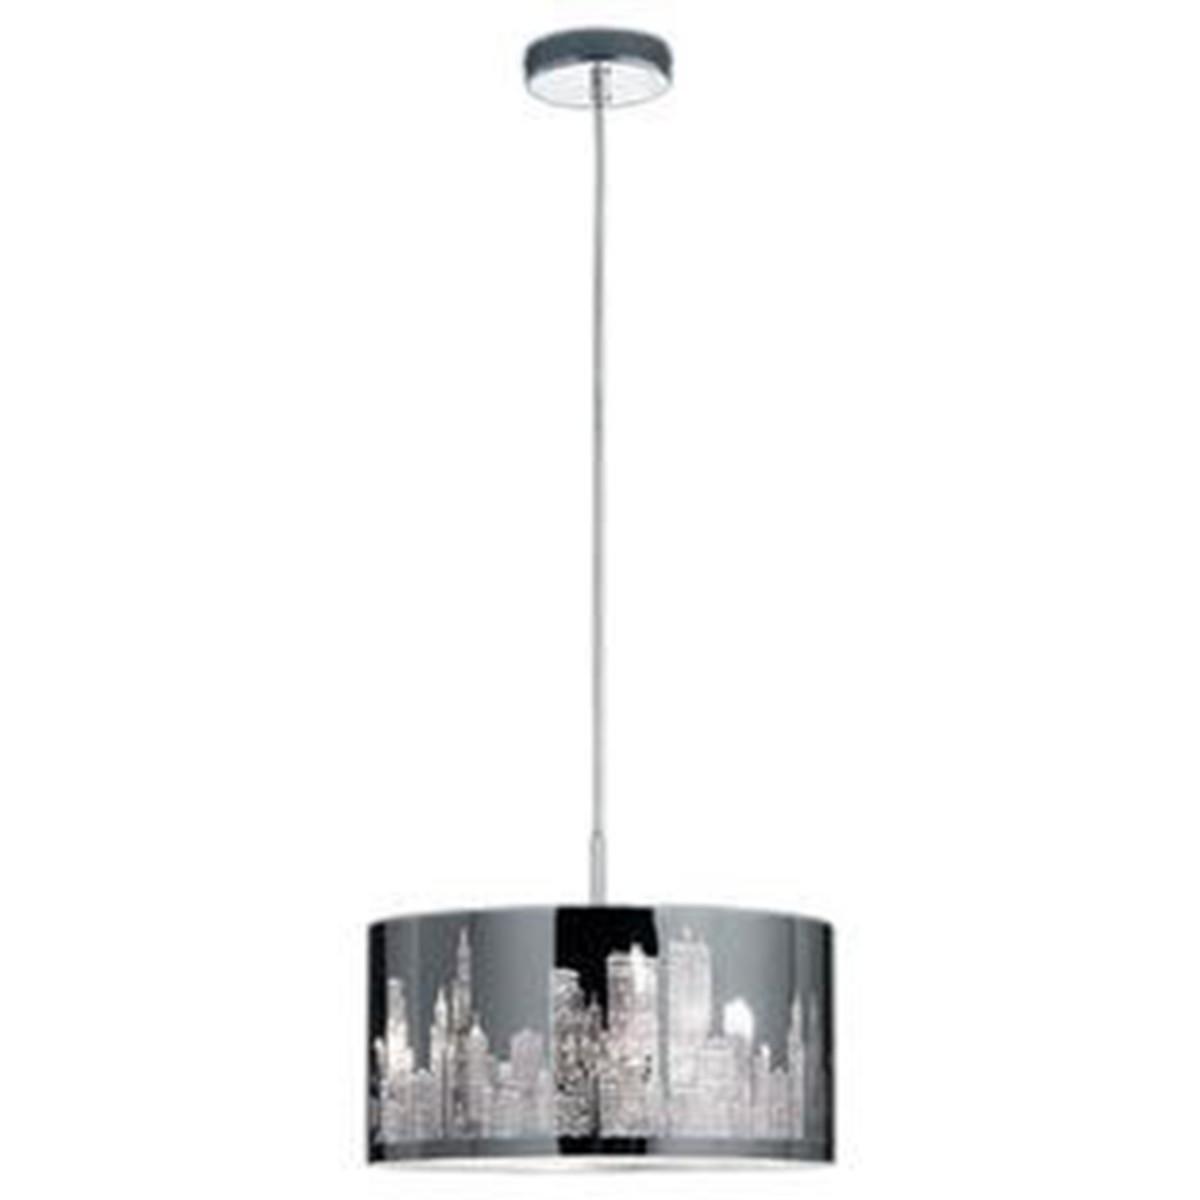 LED Hanglamp - Trion Kimo - E14 Fitting - Rond - Glans Chroom - Aluminium